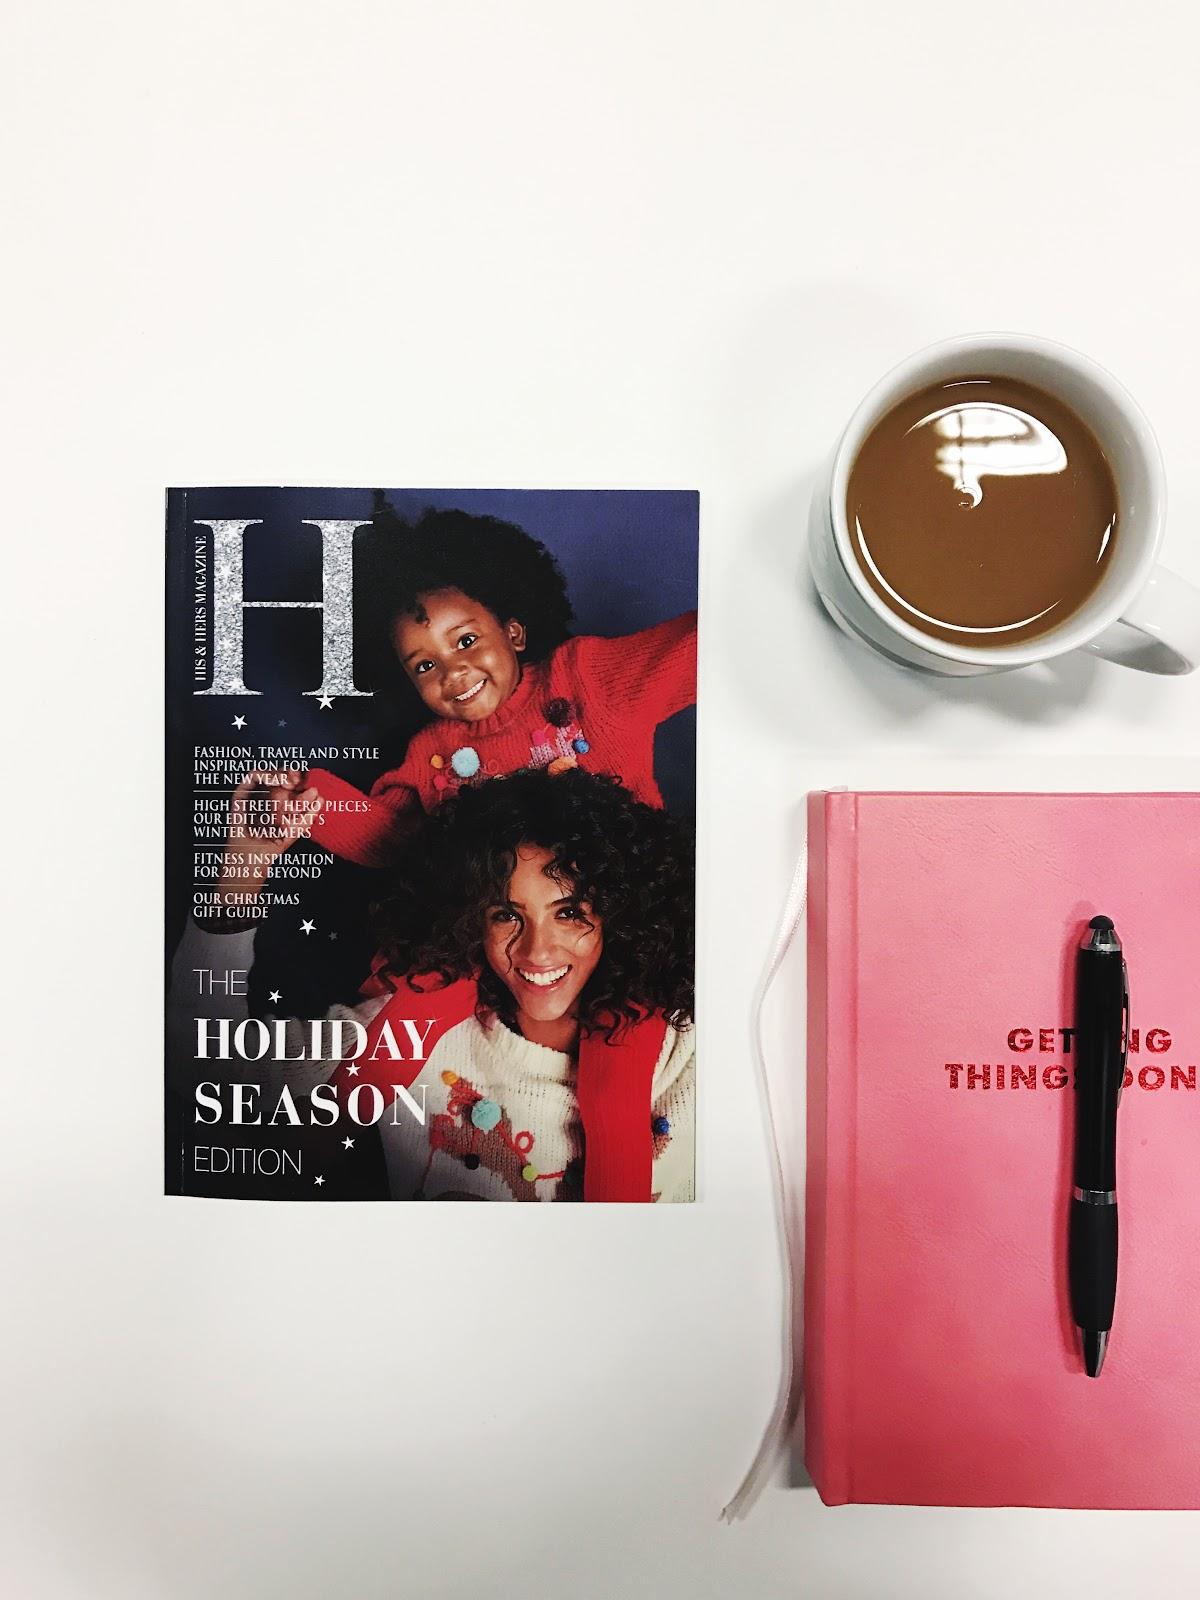 His & Hers Magazine